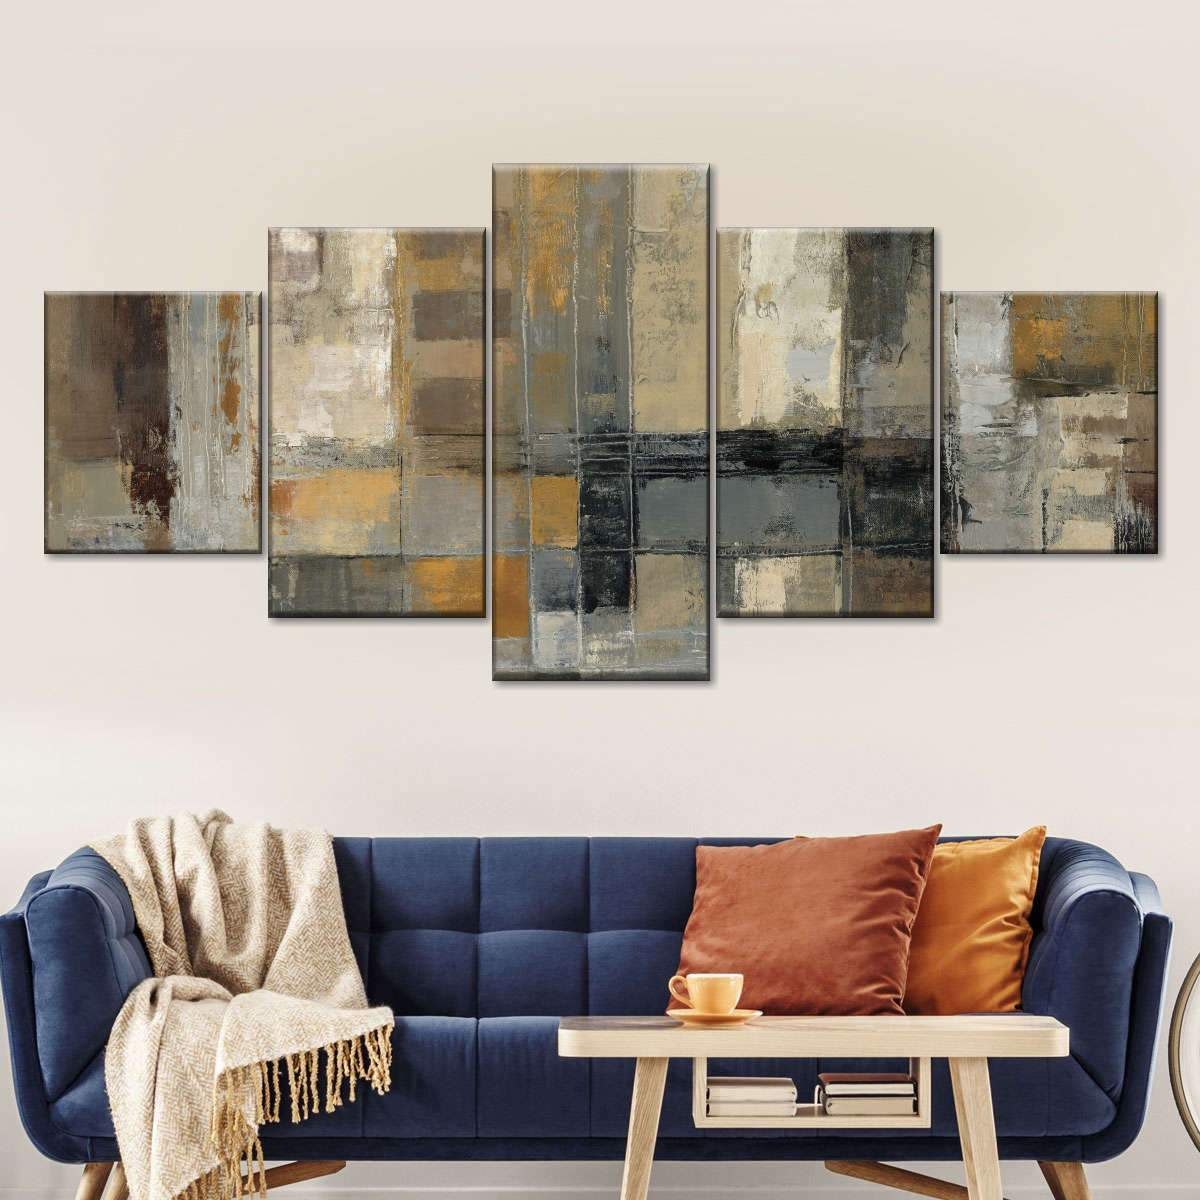 One Way Street Multi Panel Canvas Wall Art